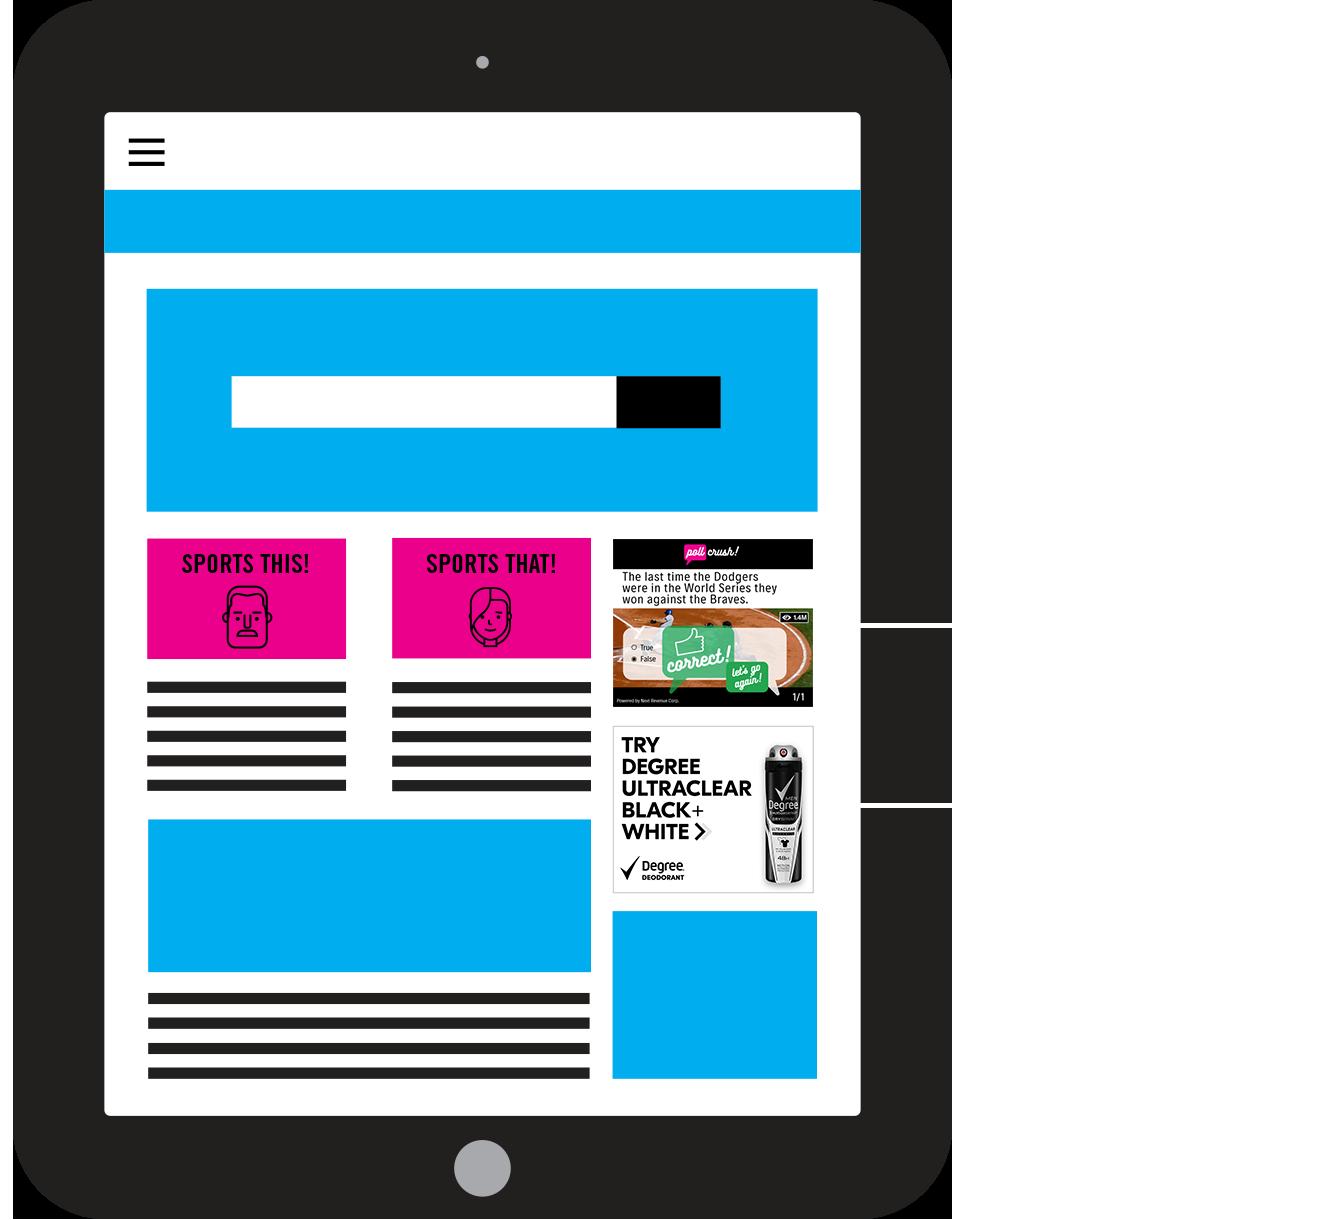 pollcrush-ipad-layout-ANNOTATIONS3.png